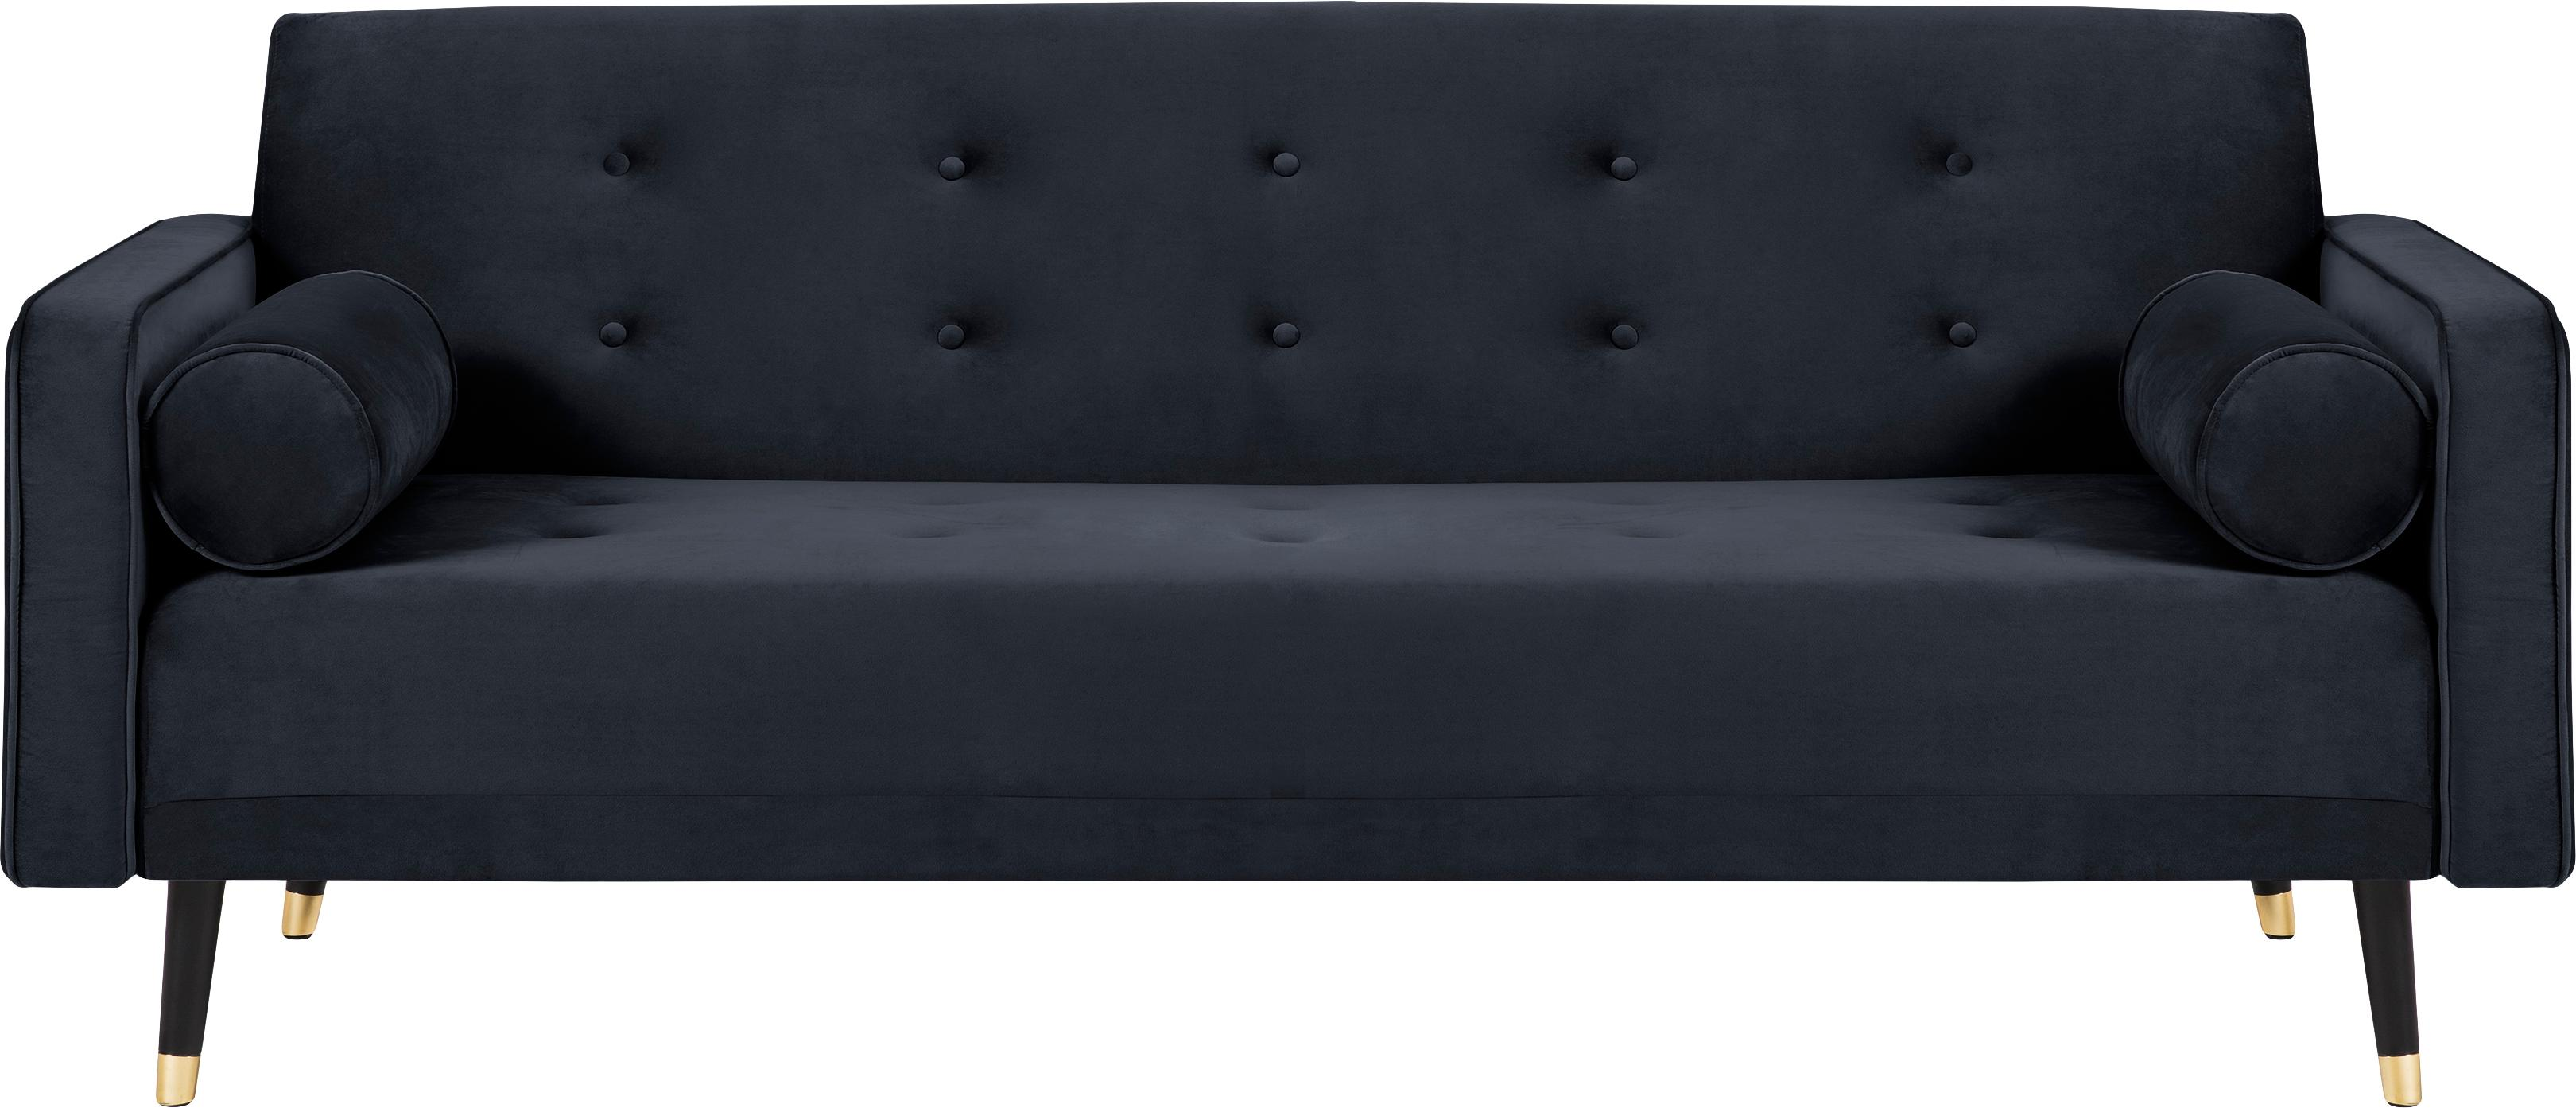 Fluwelen slaapbank Gia (3-zits), Bekleding: polyester fluweel, Frame: massief grenenhout, Poten: gelakt beukenhout, Fluweel blauw, B 212 x D 93 cm